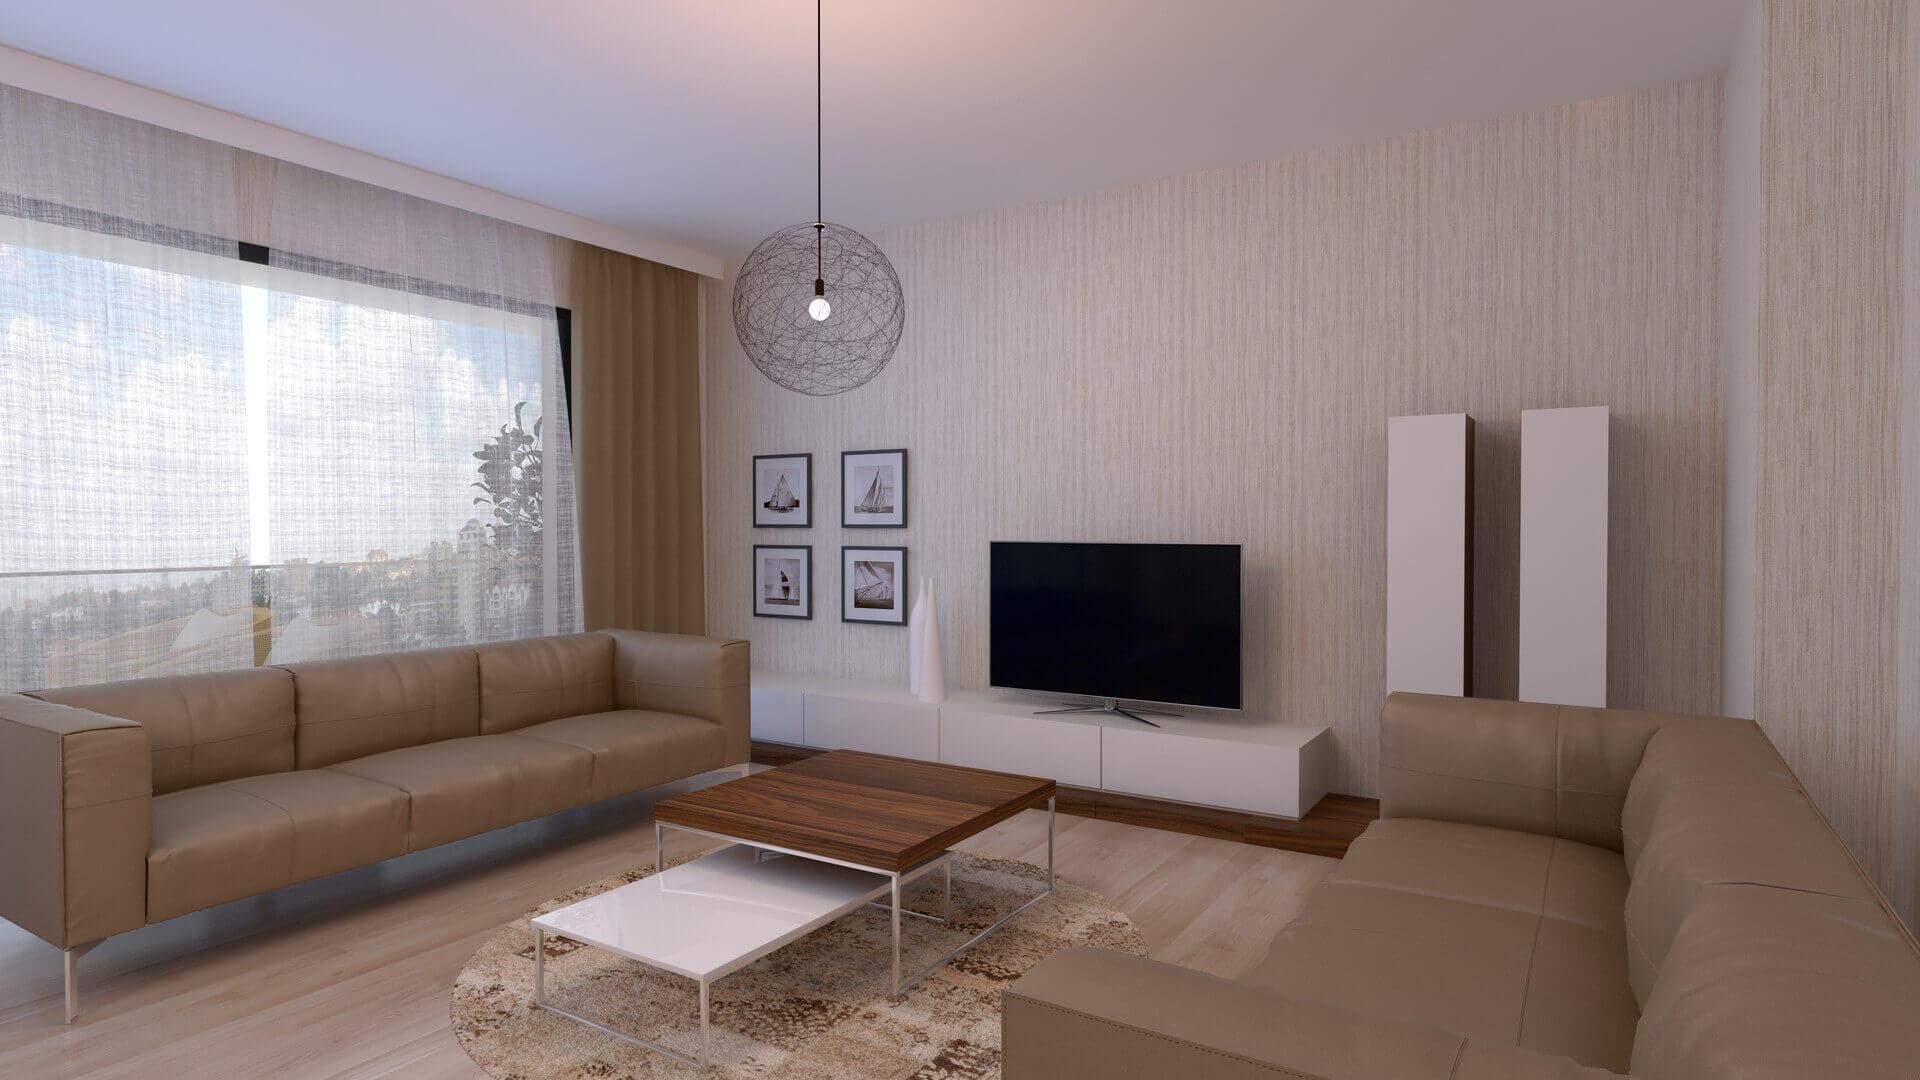 Villa iç dekorasyon 3471 Signature Residence Konutlar